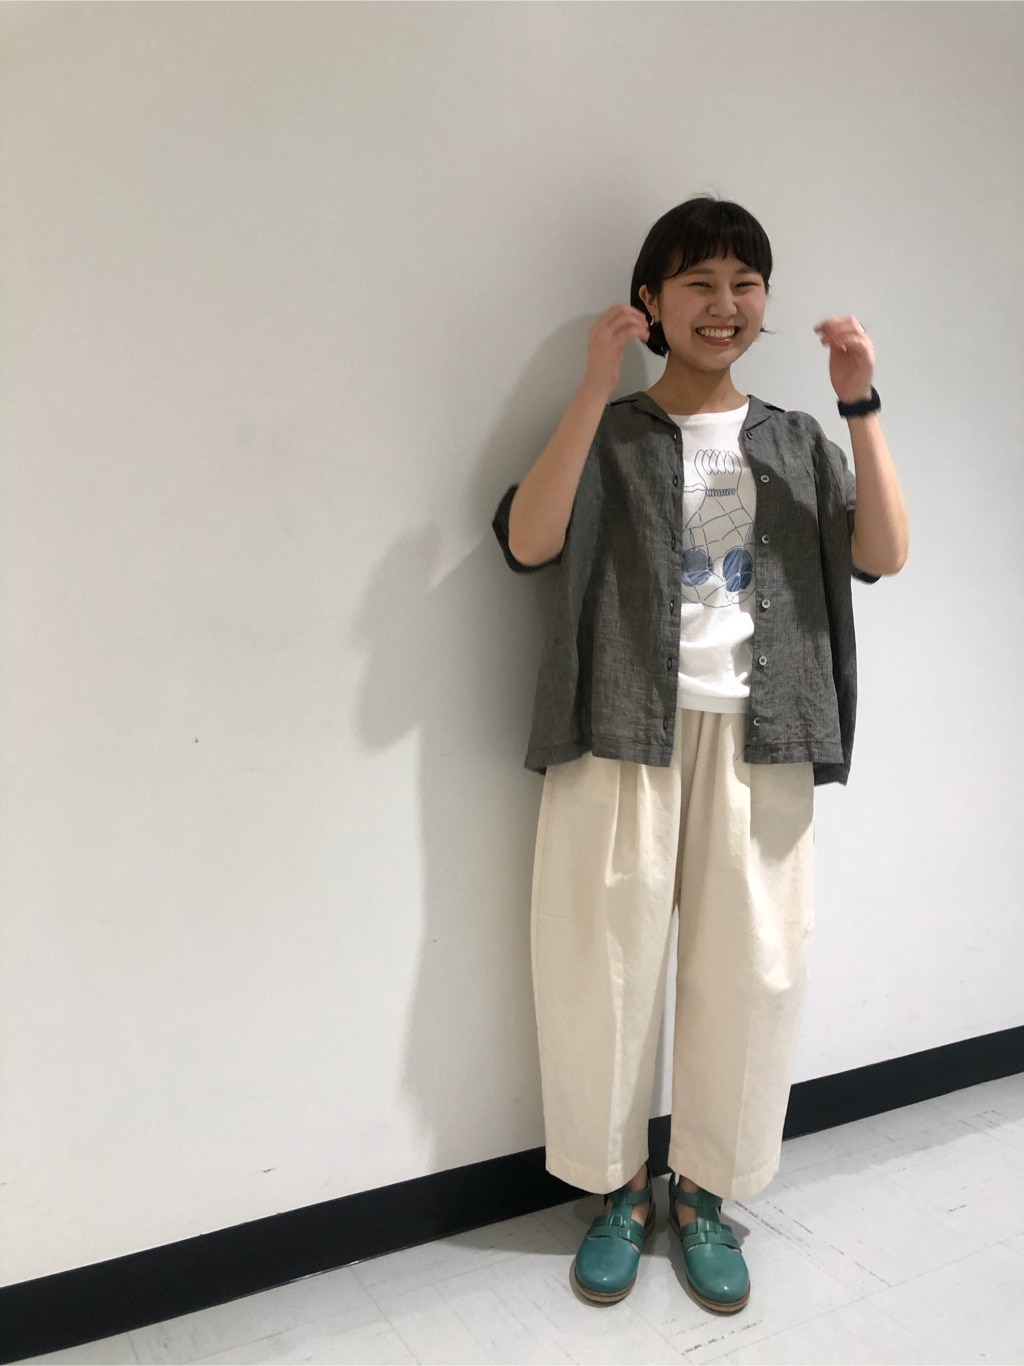 bulle de savon なんばシティ 身長:149cm 2020.06.11